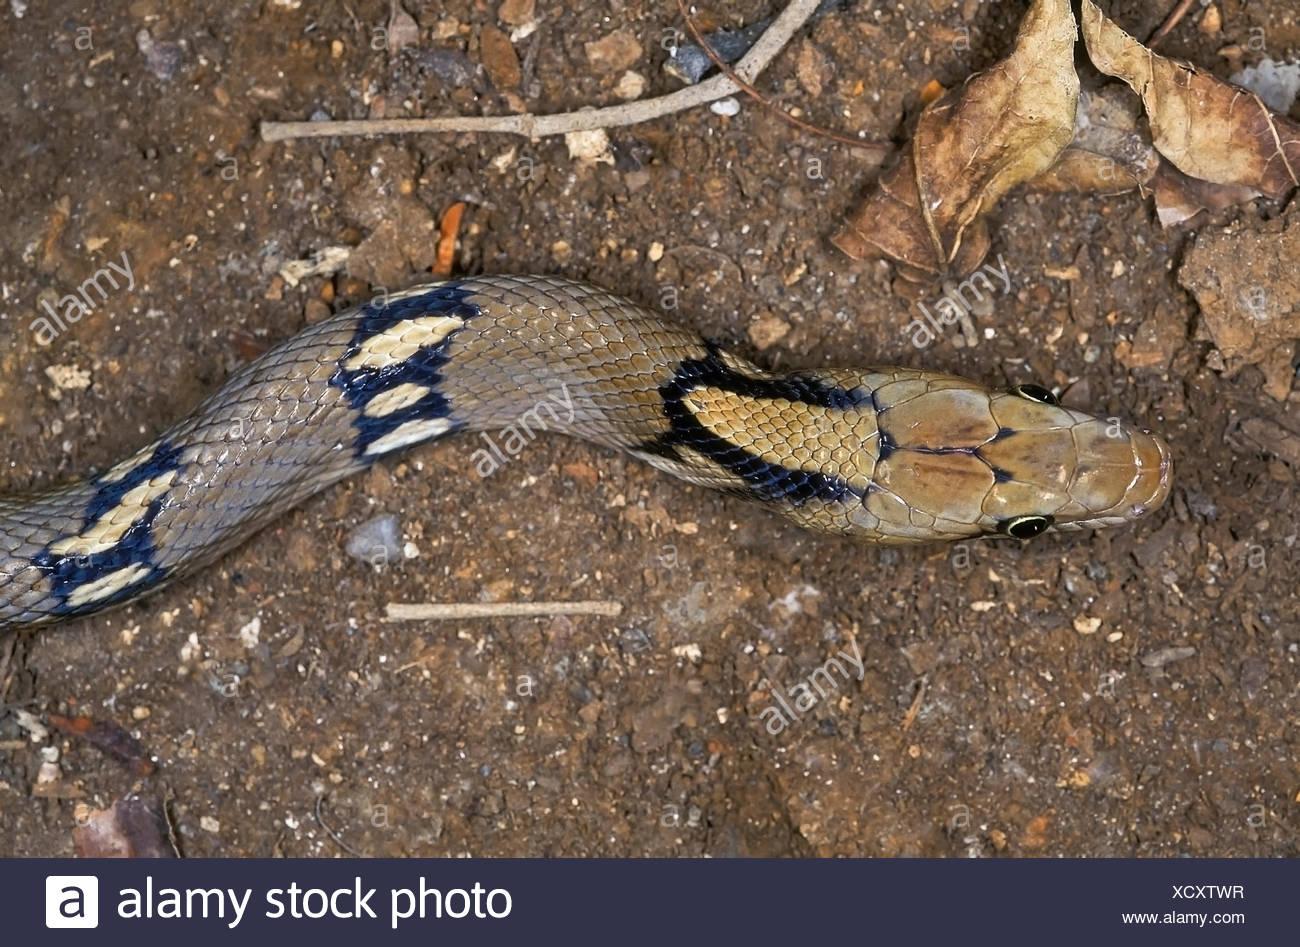 MONTANE KINKERLITZCHEN Schlange Coelognathus Helena Monticollaris. Kopf. Muster von Amboli, Maharashtra, Indien. Stockbild